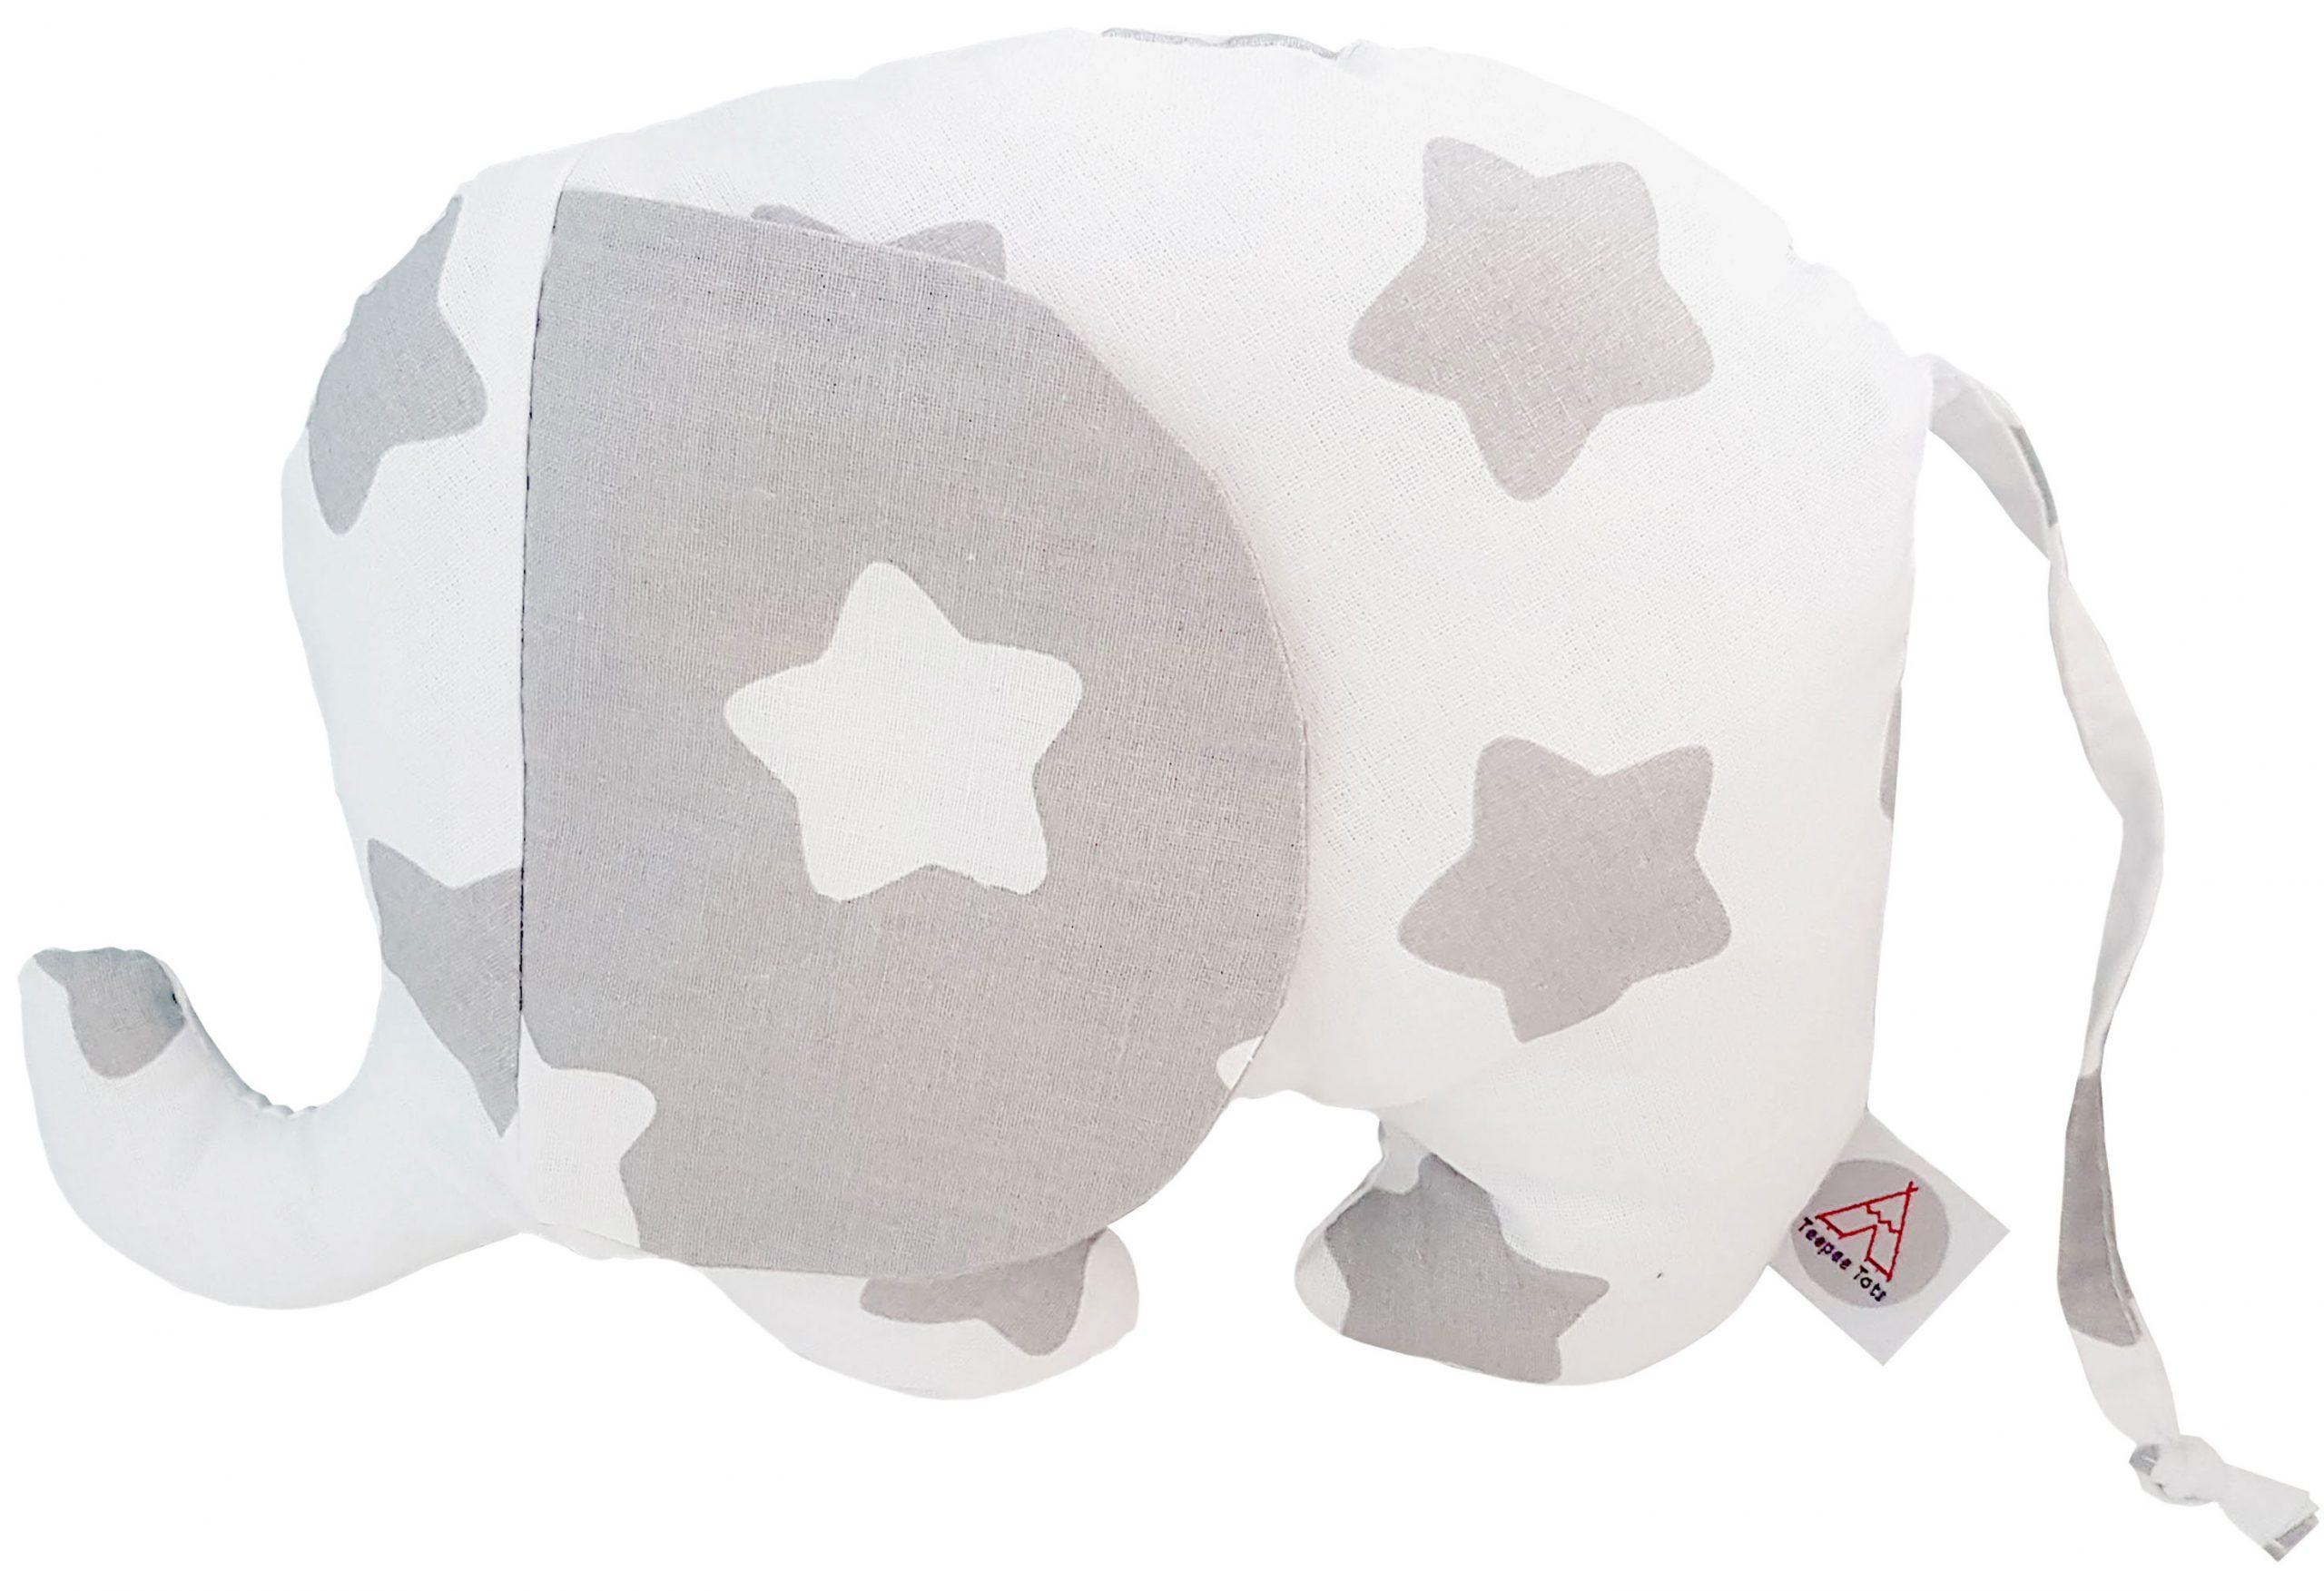 White-and-grey-stuffed-elephant-toypillow